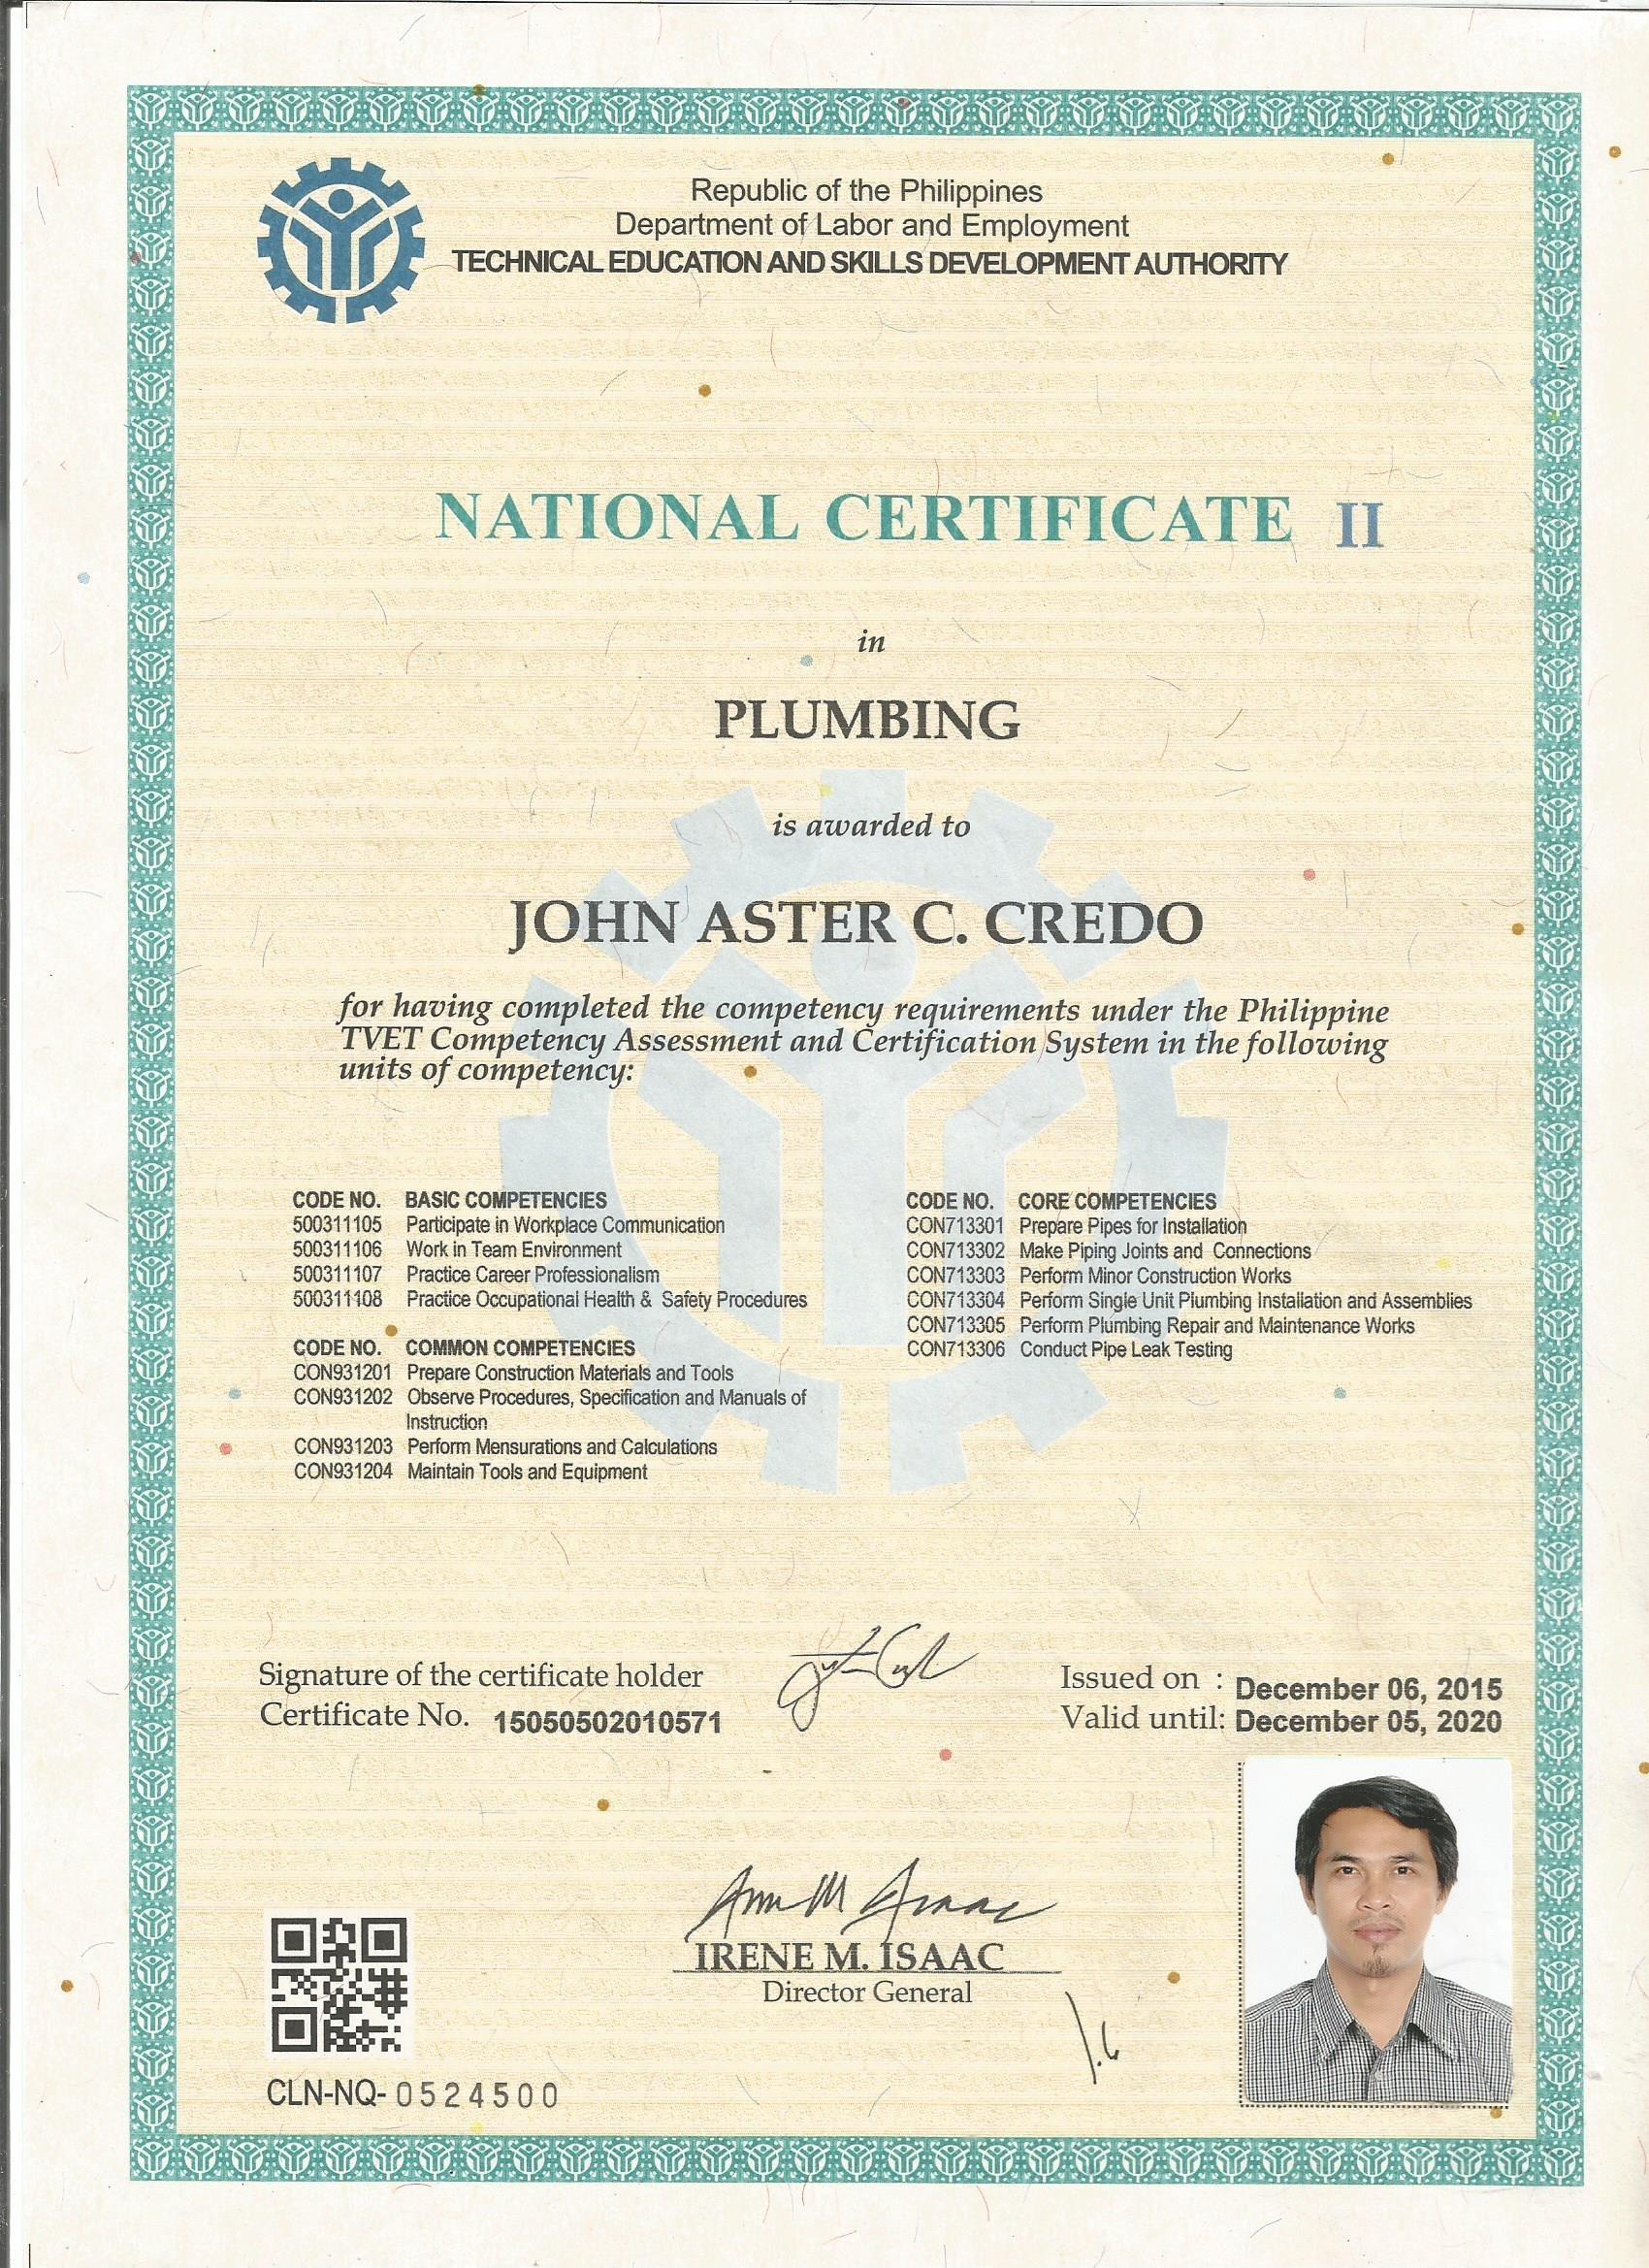 John Aster Credo Bayt